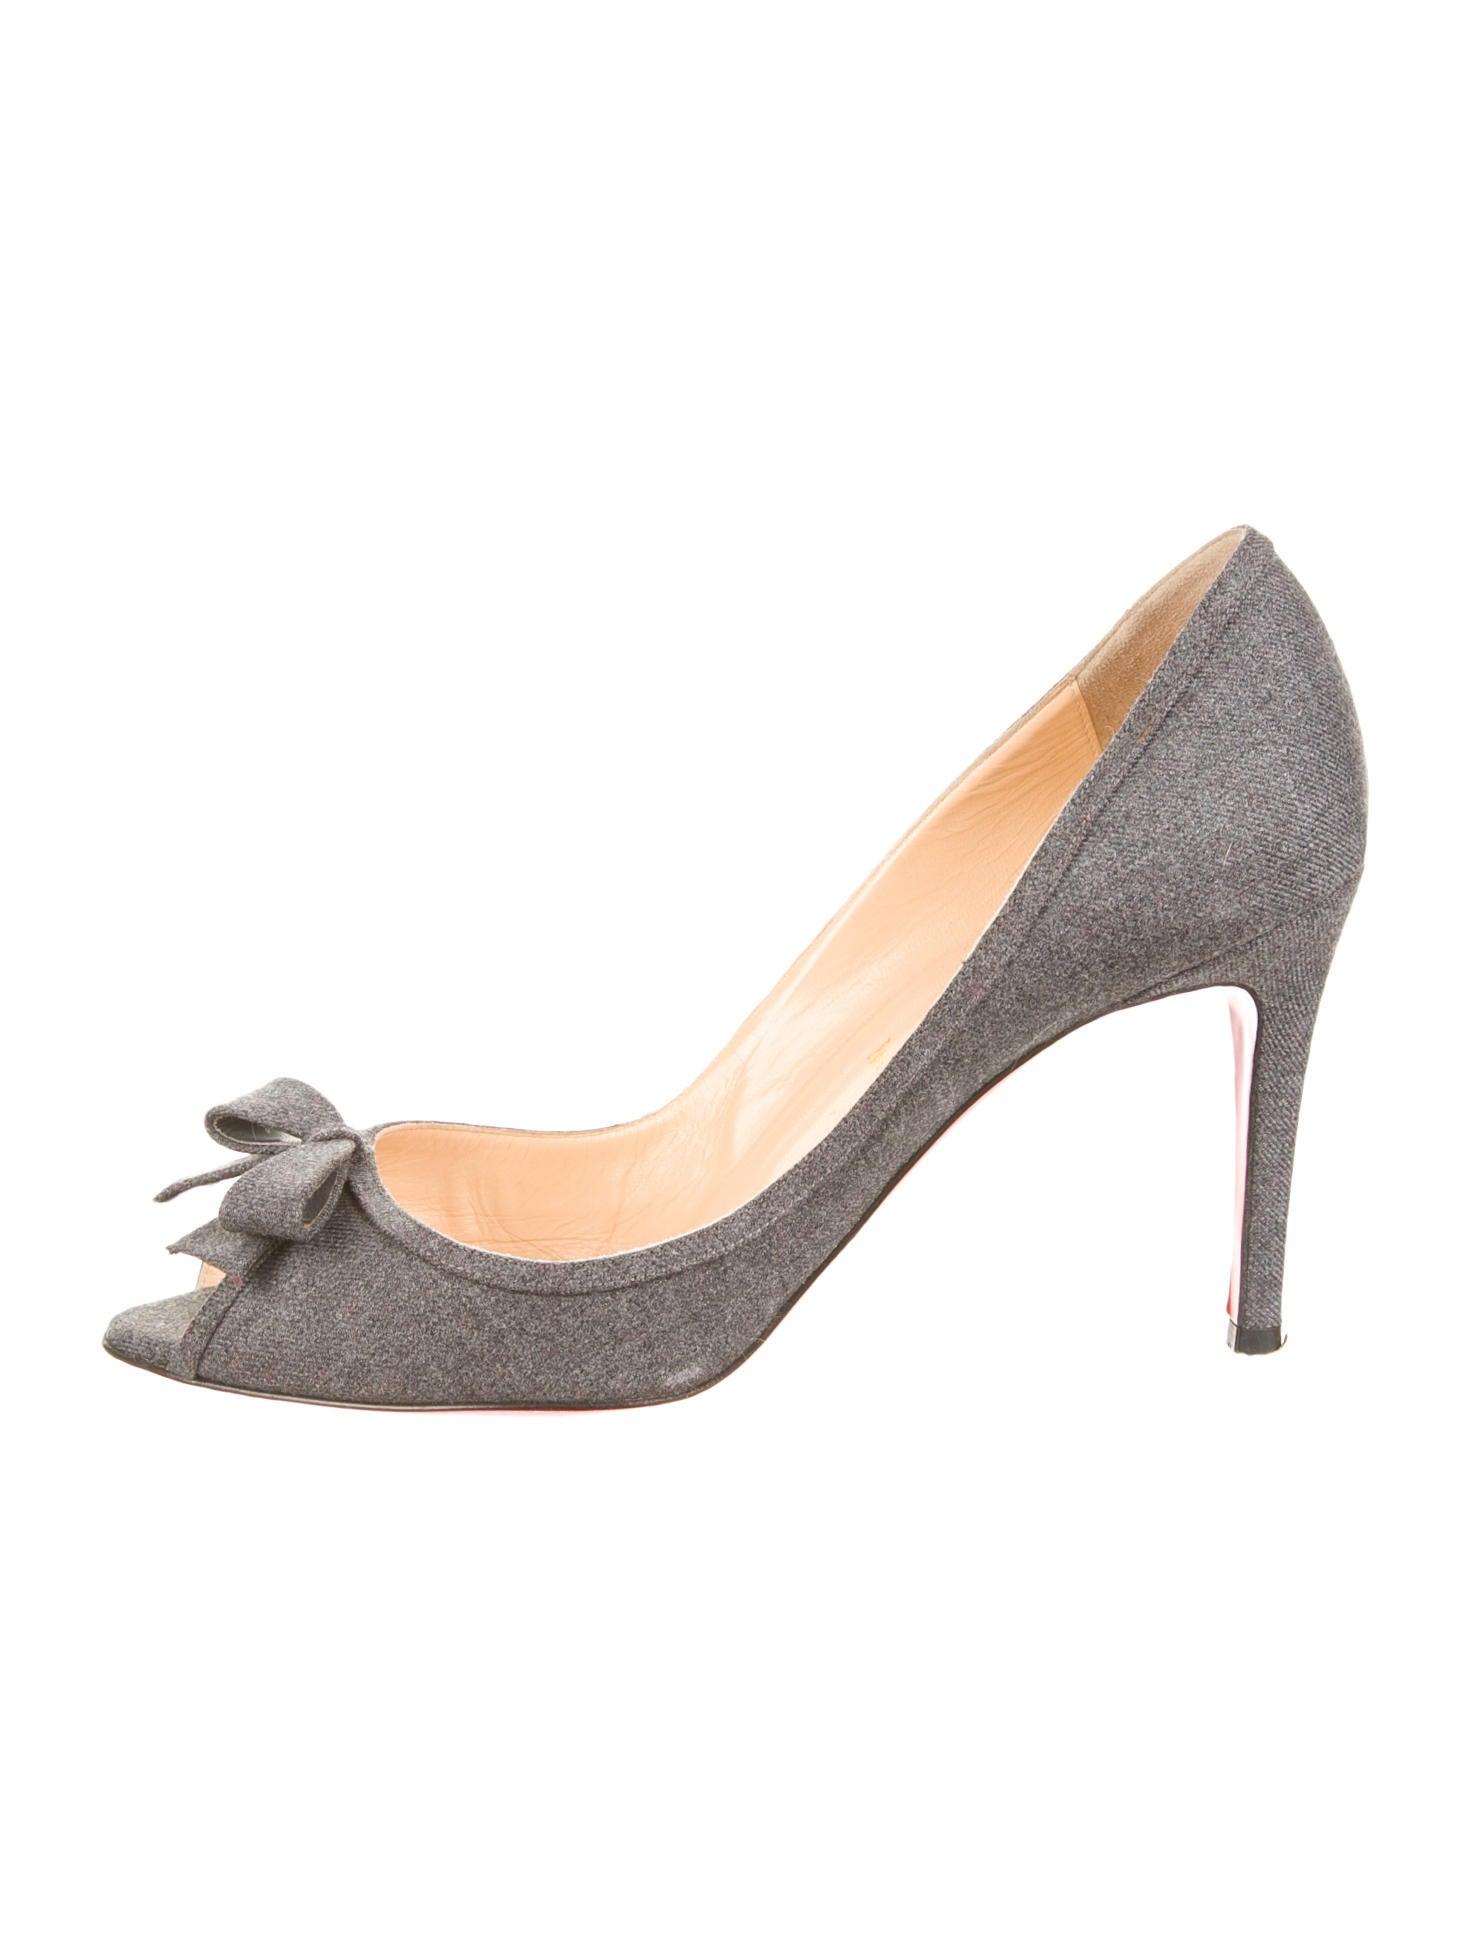 6c9ae3f9132 Artesur » christian louboutin peep-toe pumps Grey wool bow accent